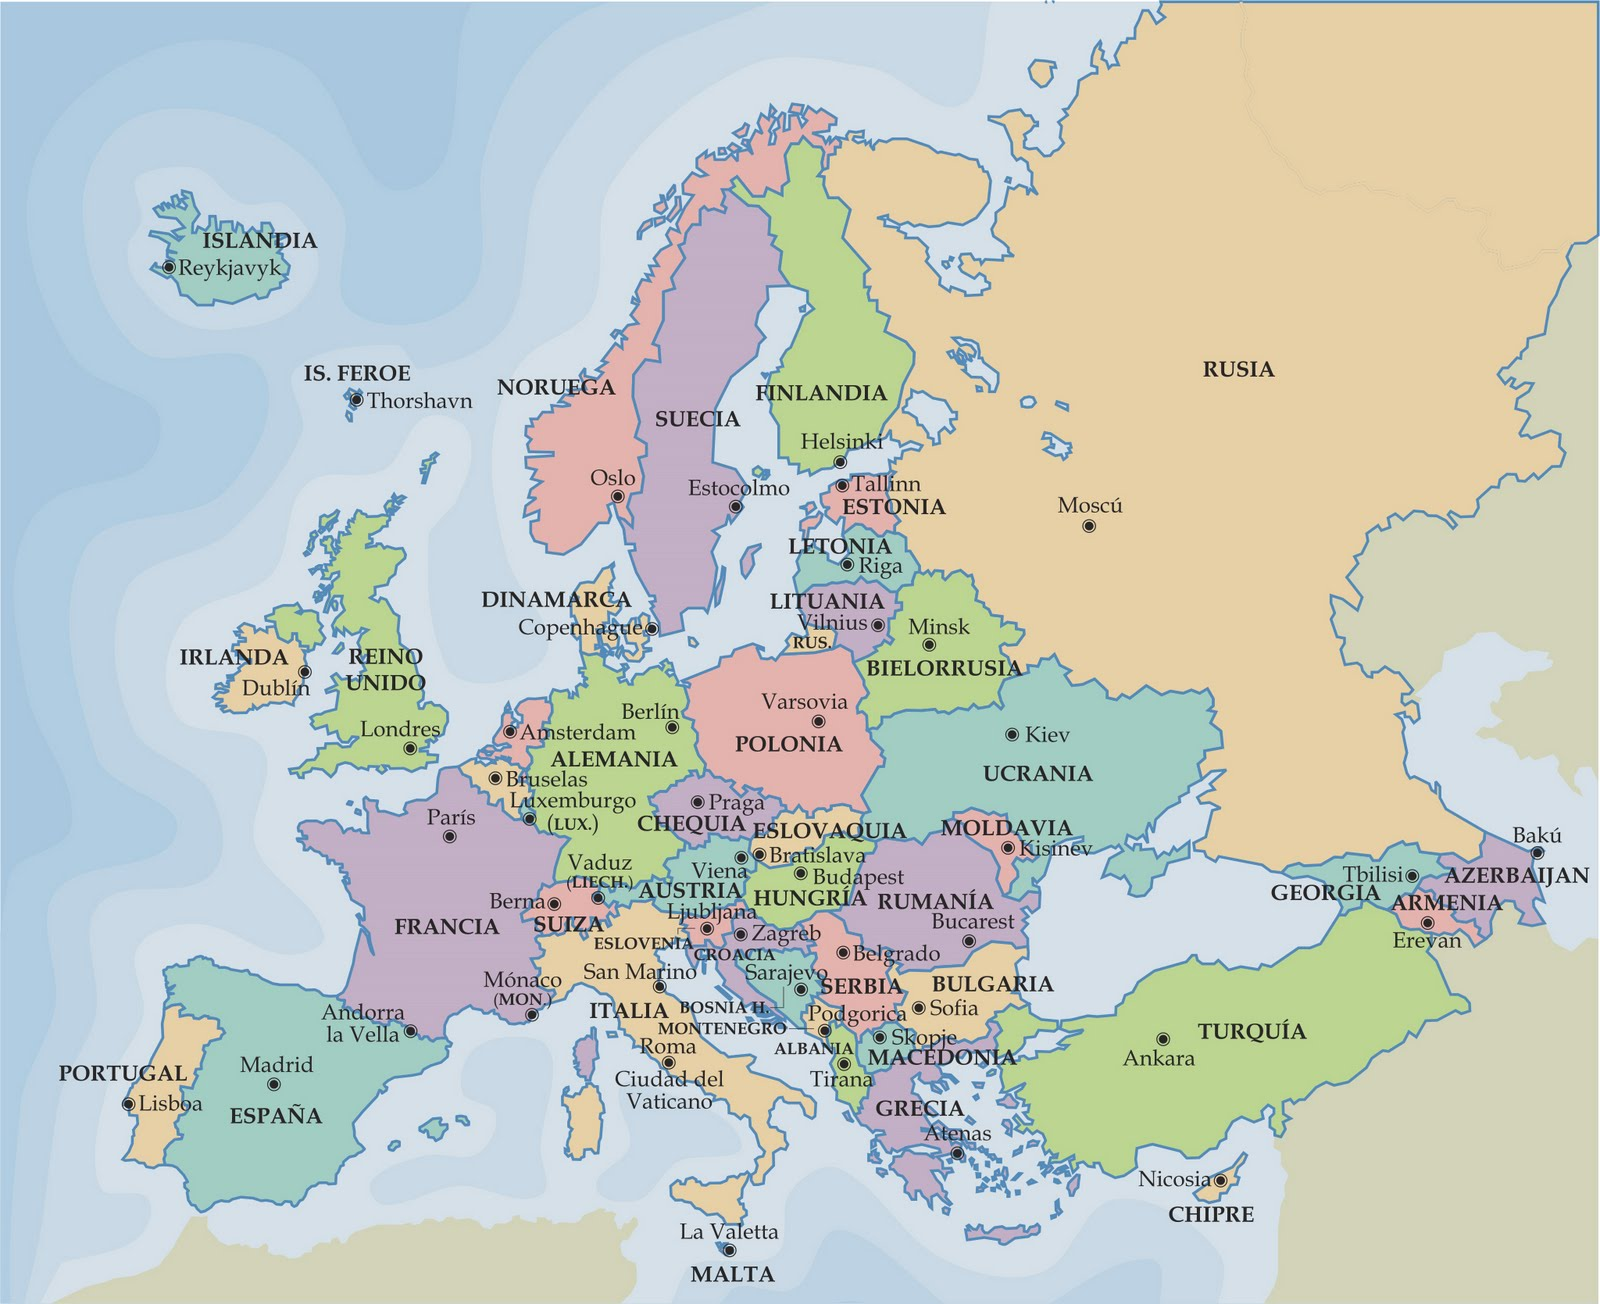 Mapa Politico De Europa Ejercicios